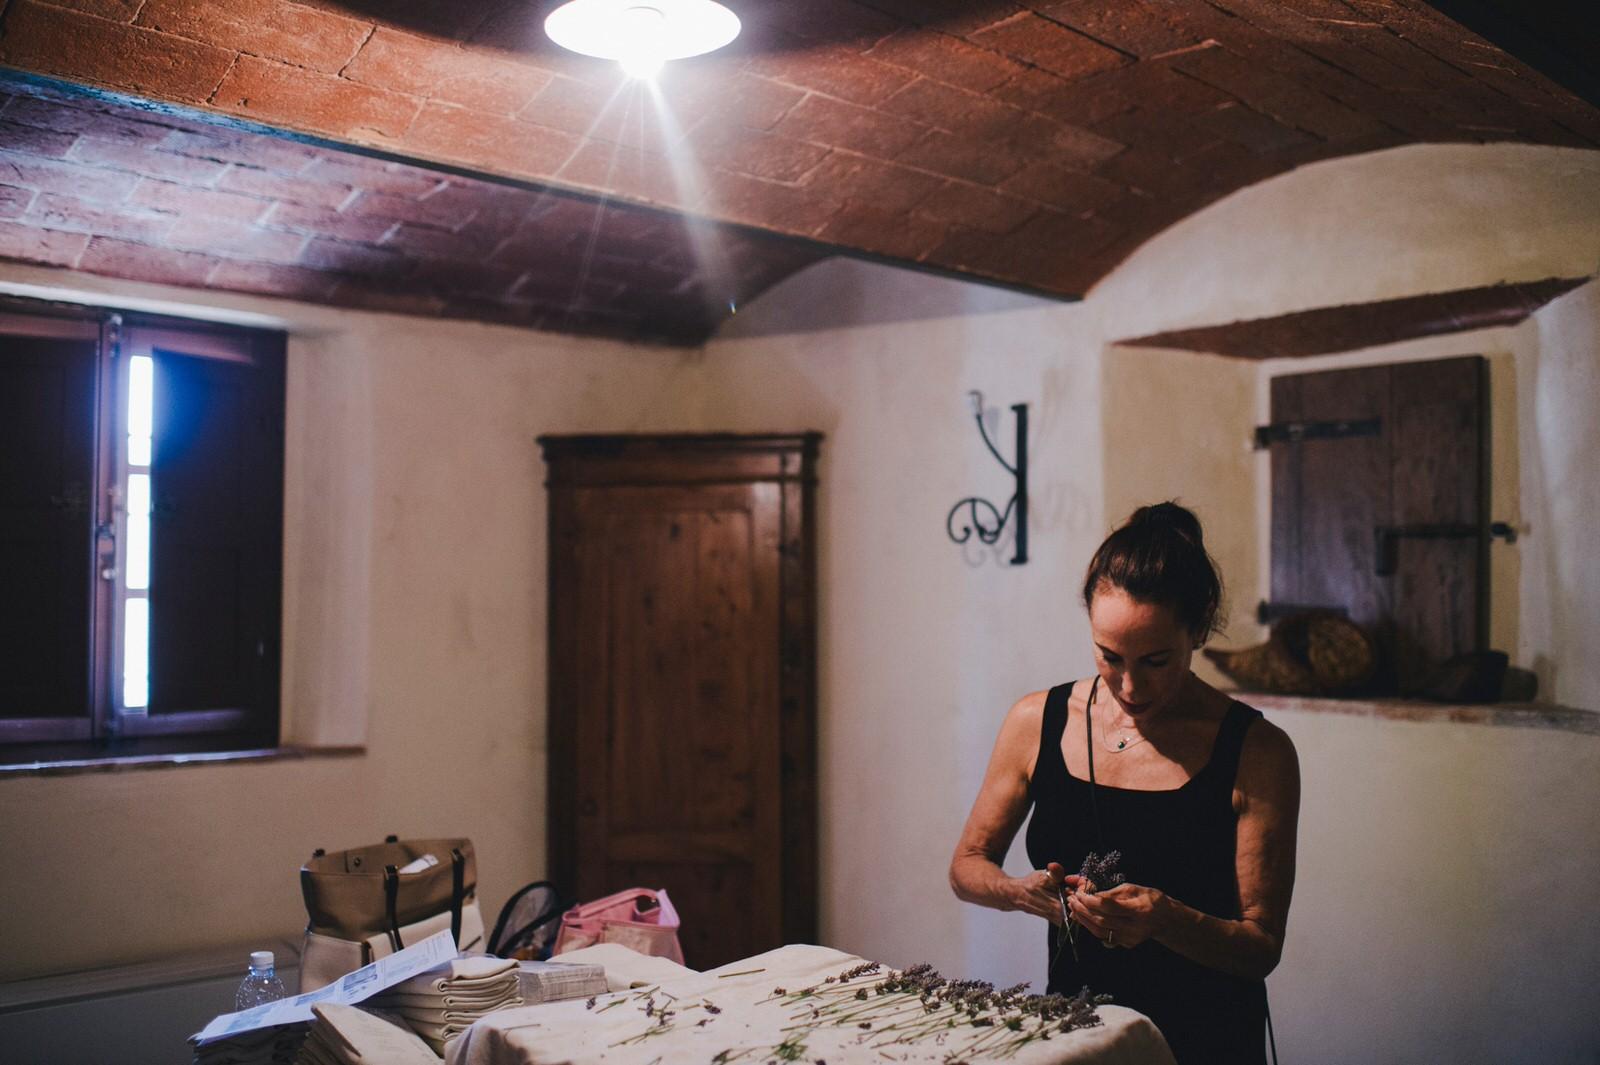 tuscany wedding the wedding planner preparing flower decoration